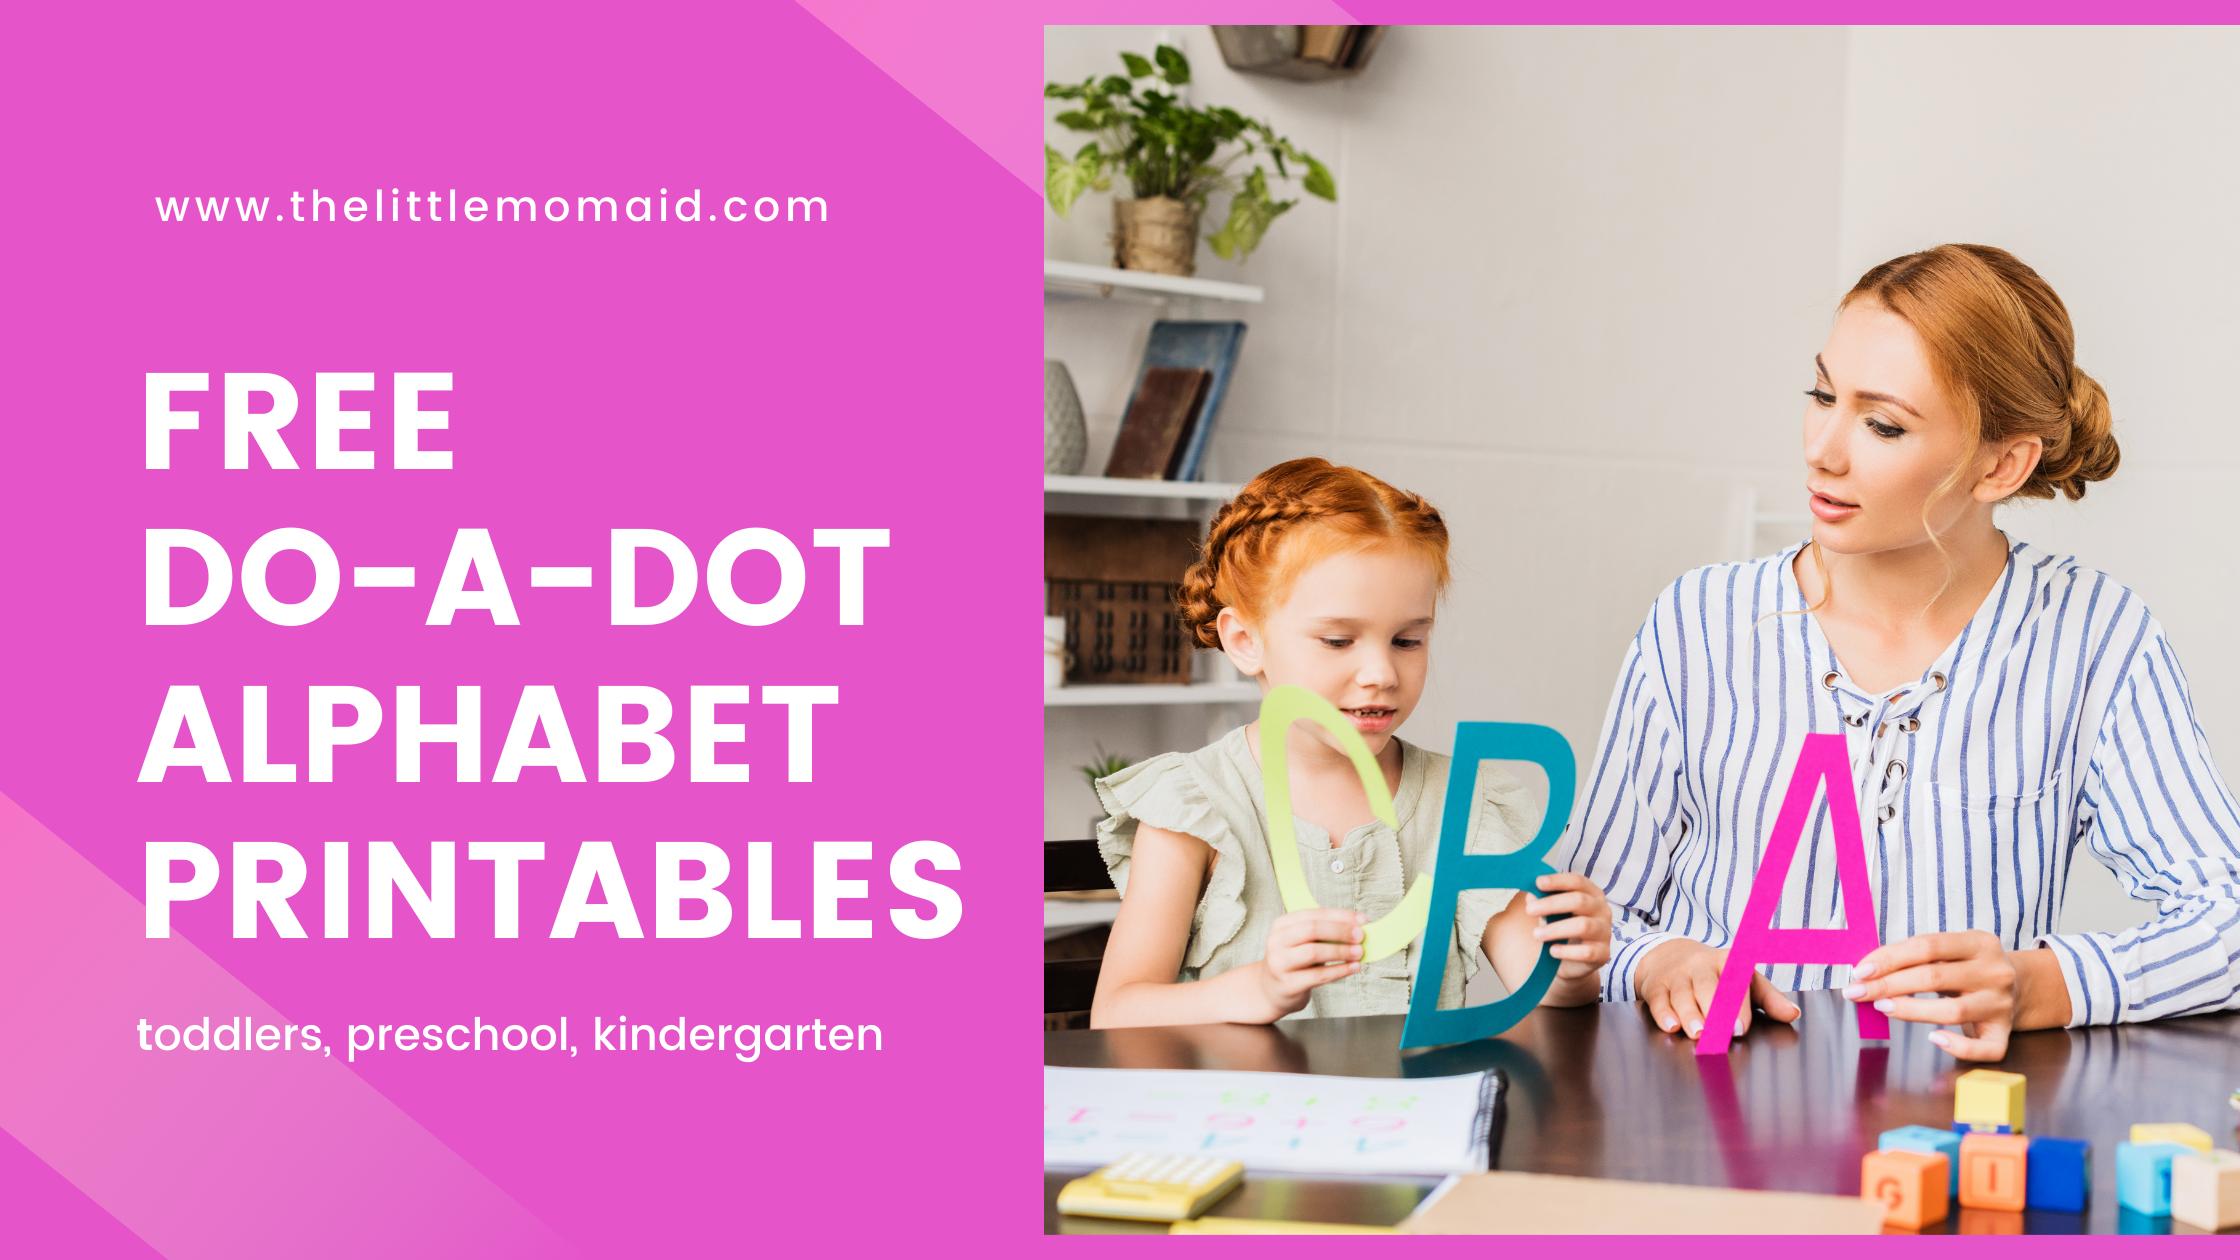 free do-a-dot letter worksheets